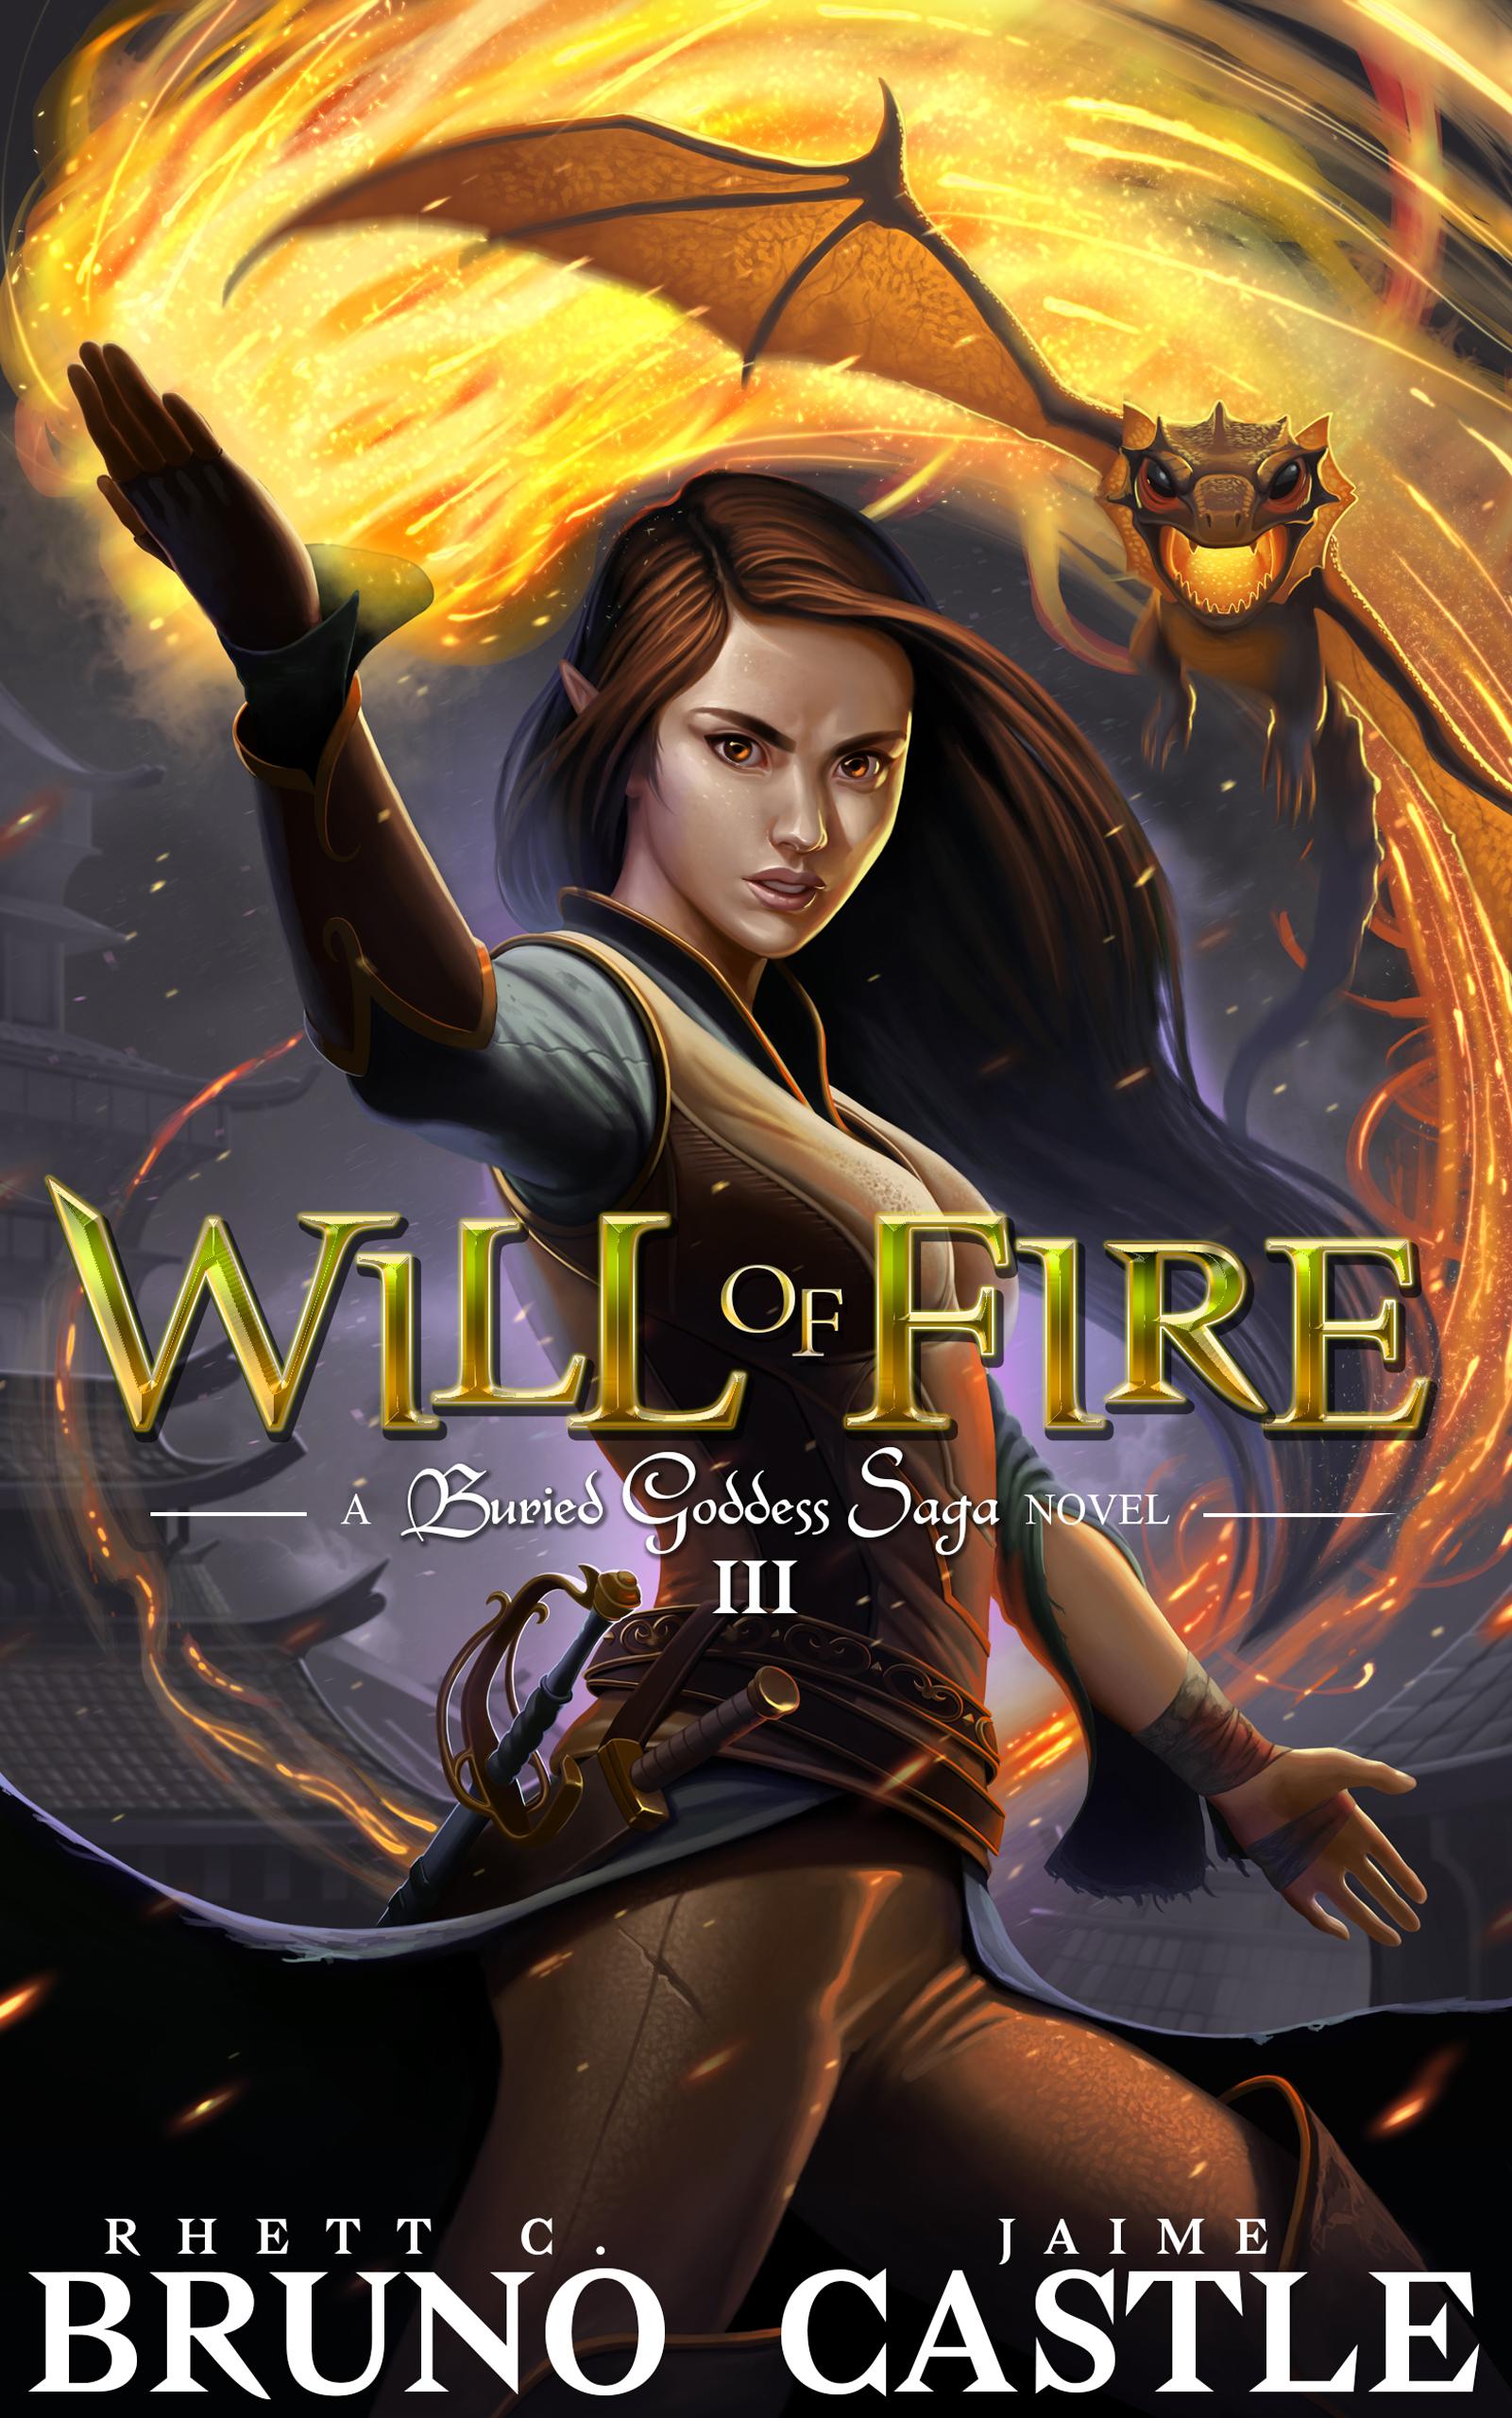 Will of Fire   Buried Goddess Saga Book 3  Rhett C. Bruno & Jaime Castle